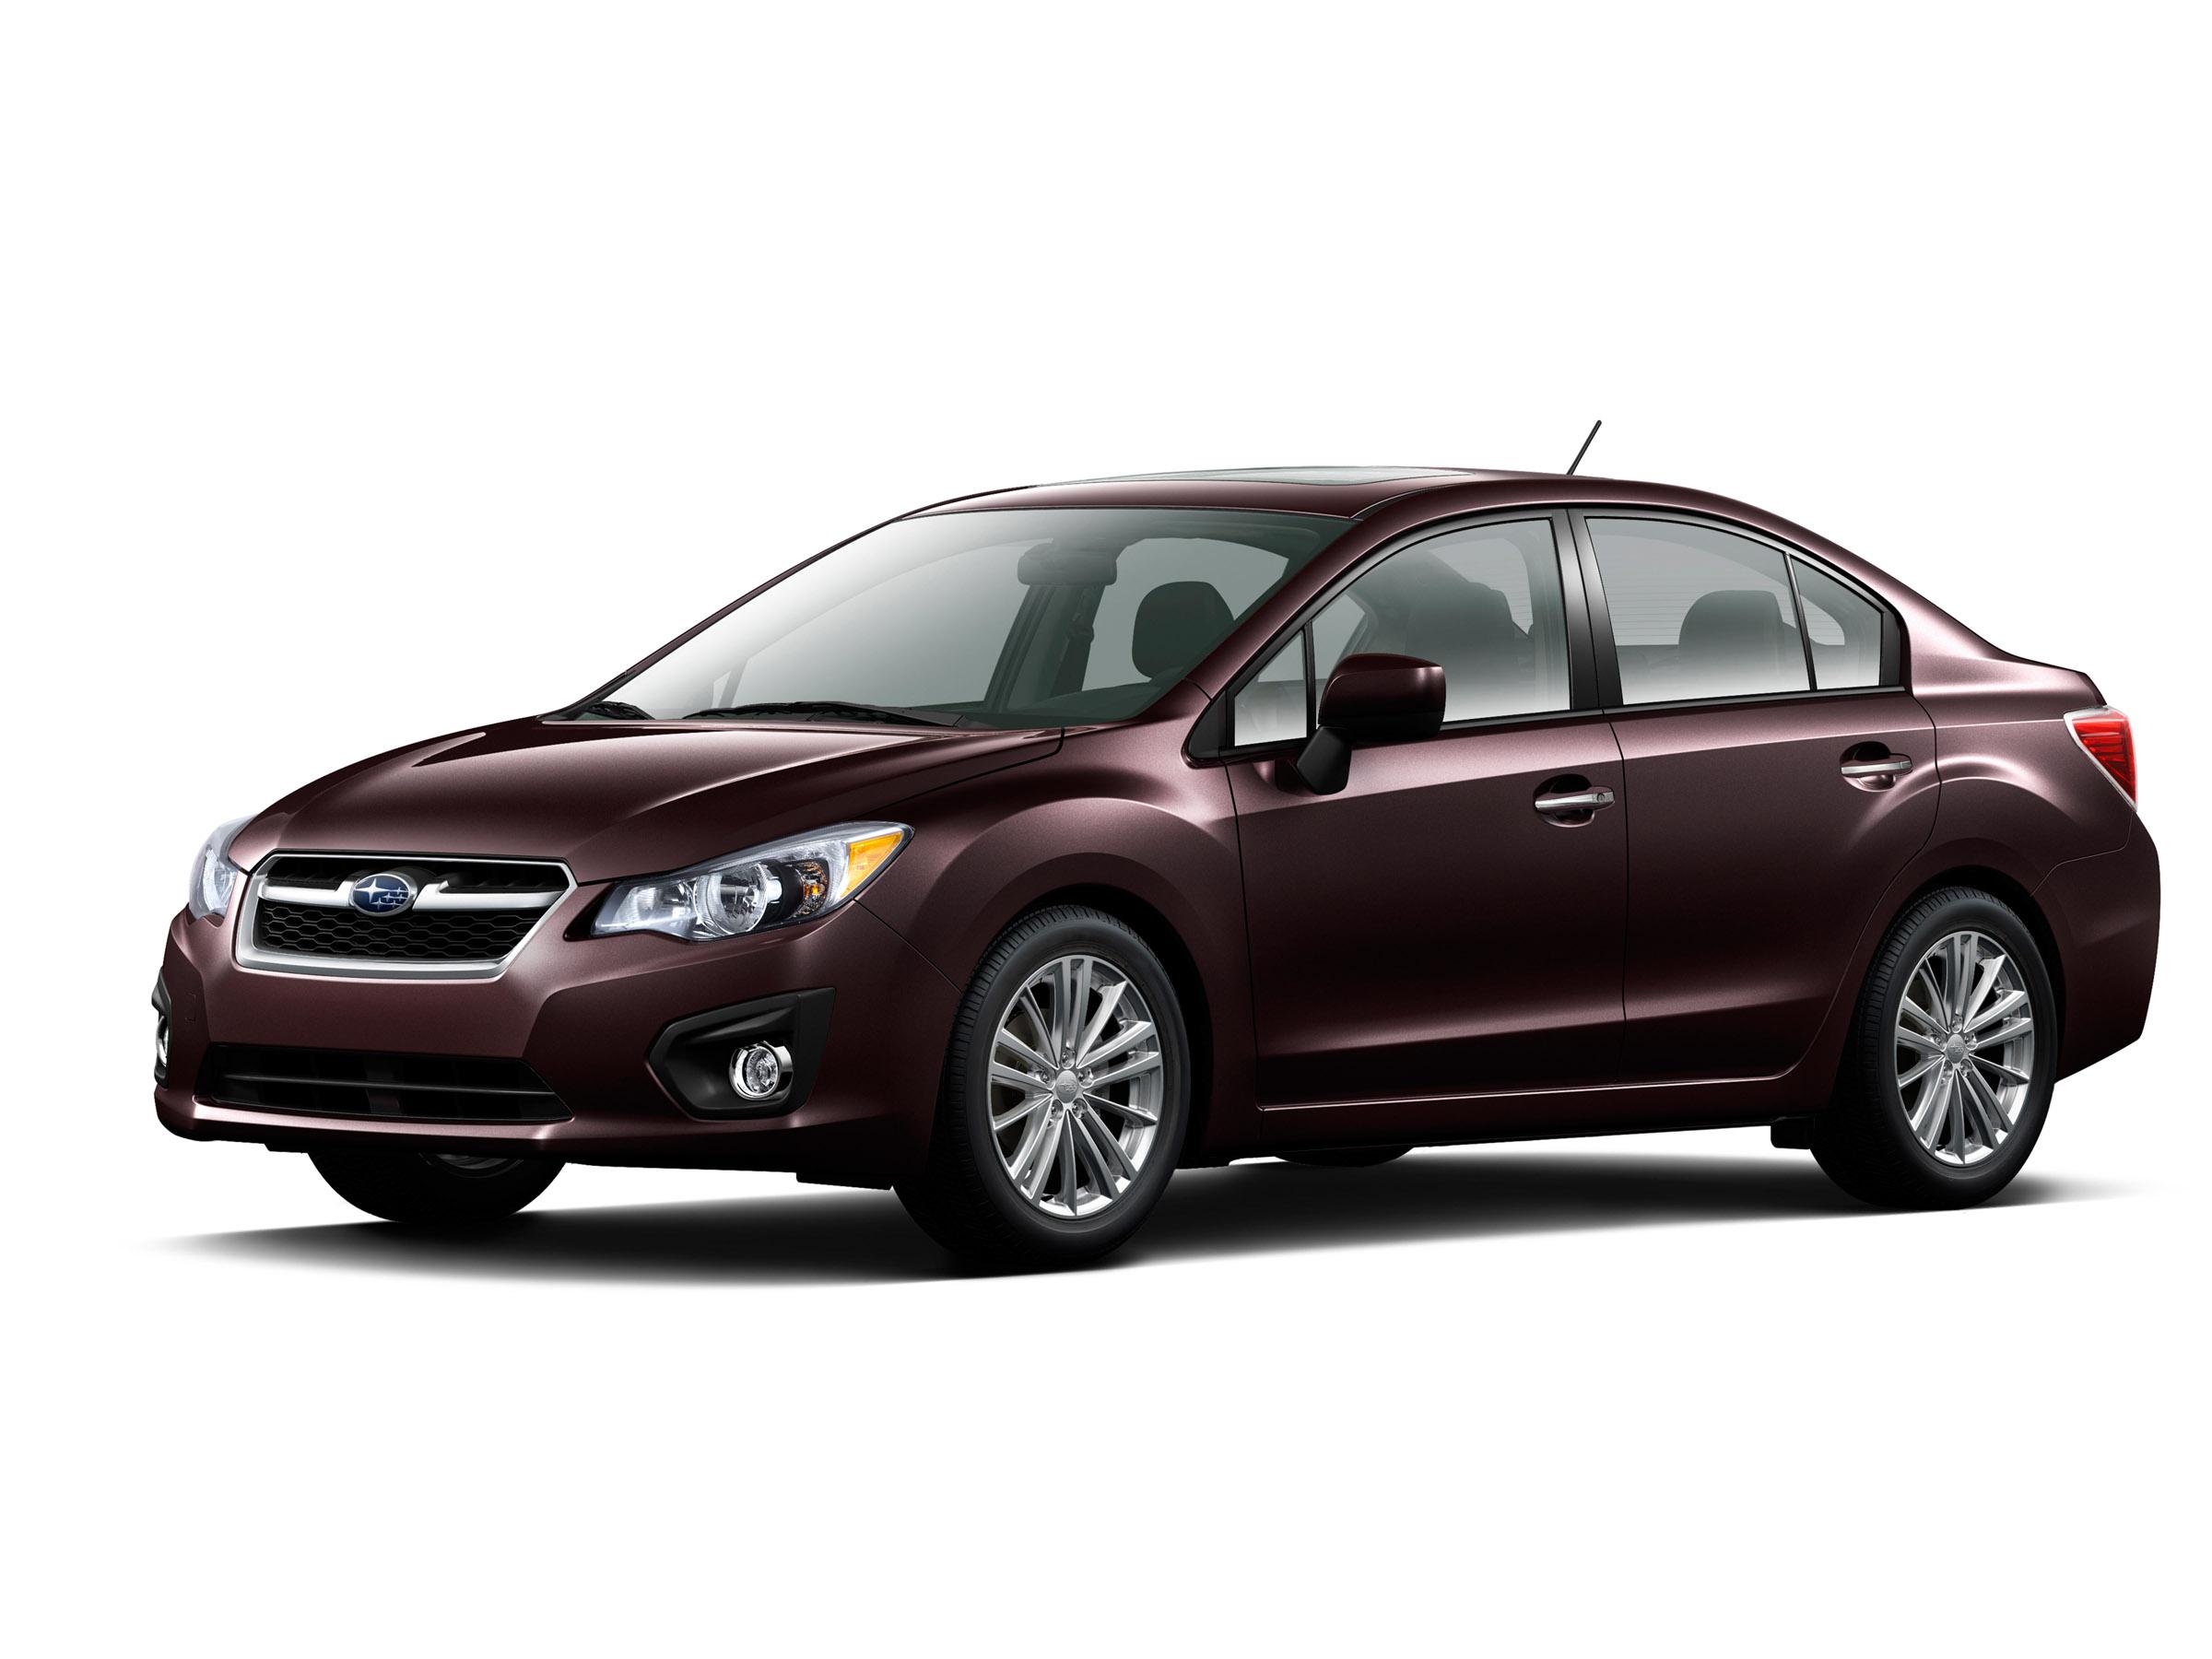 2012 - Subaru Impreza 2-0i лимитированная четвертая версия (фотографии) - фотография №5